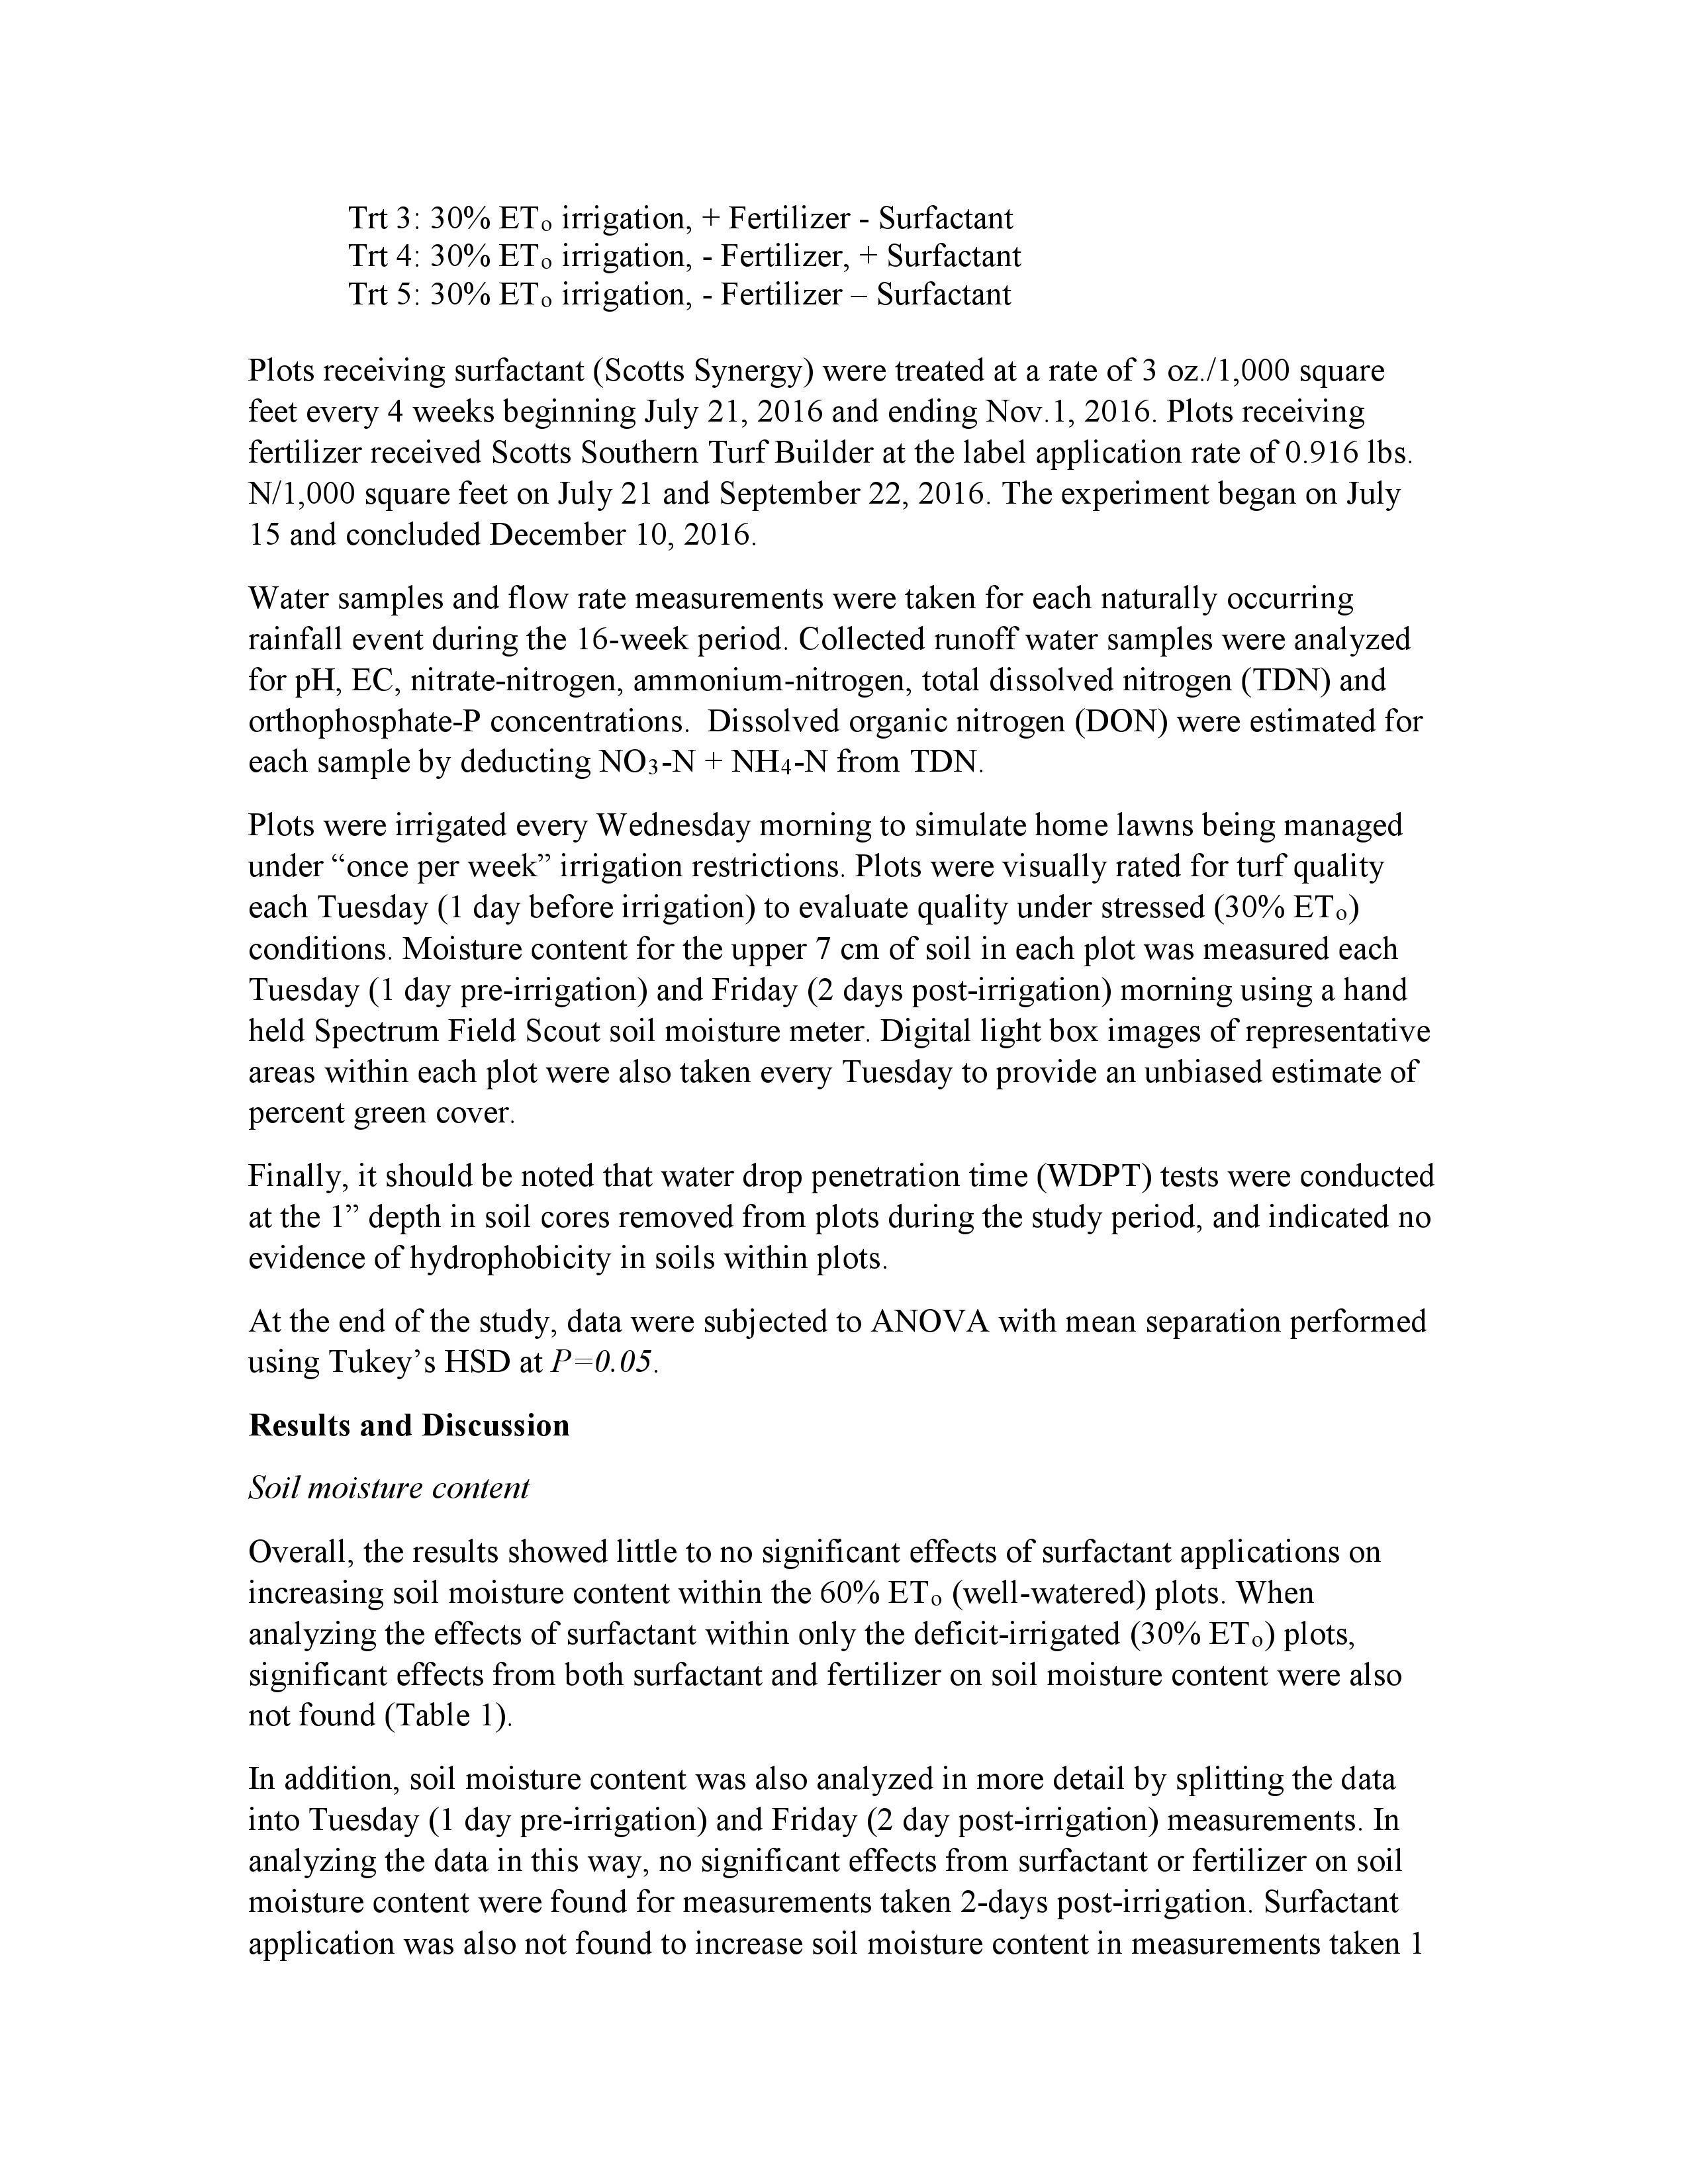 Reports (Current) | Texas Turfgrass Association